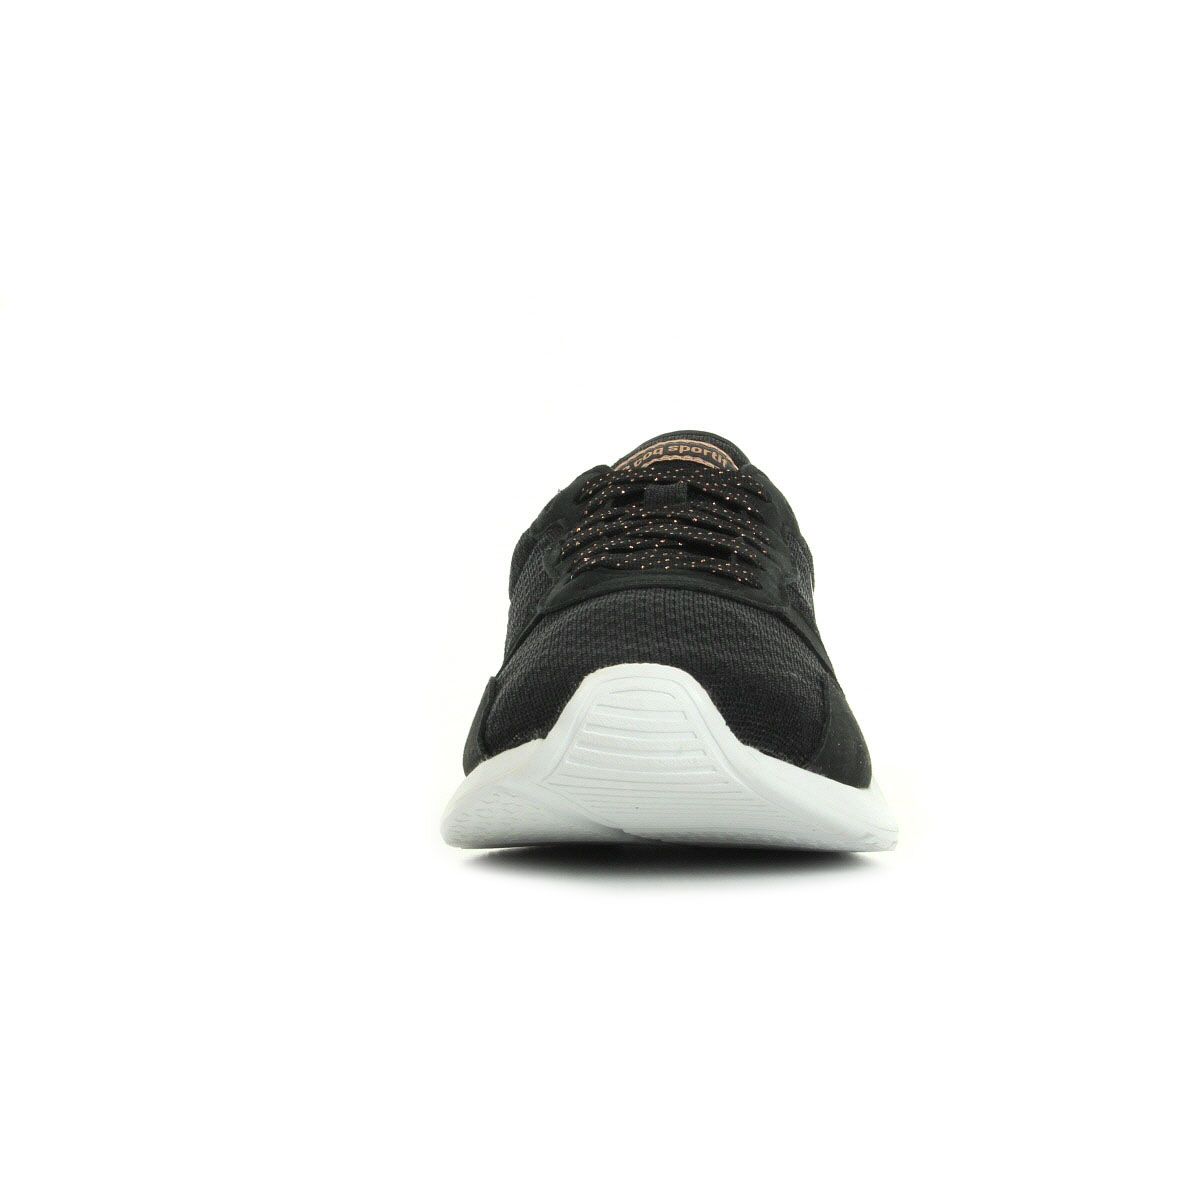 Le Coq Sportif Lcs R600 W Summer Feminine Mesh Black 1710286, Baskets mode femme